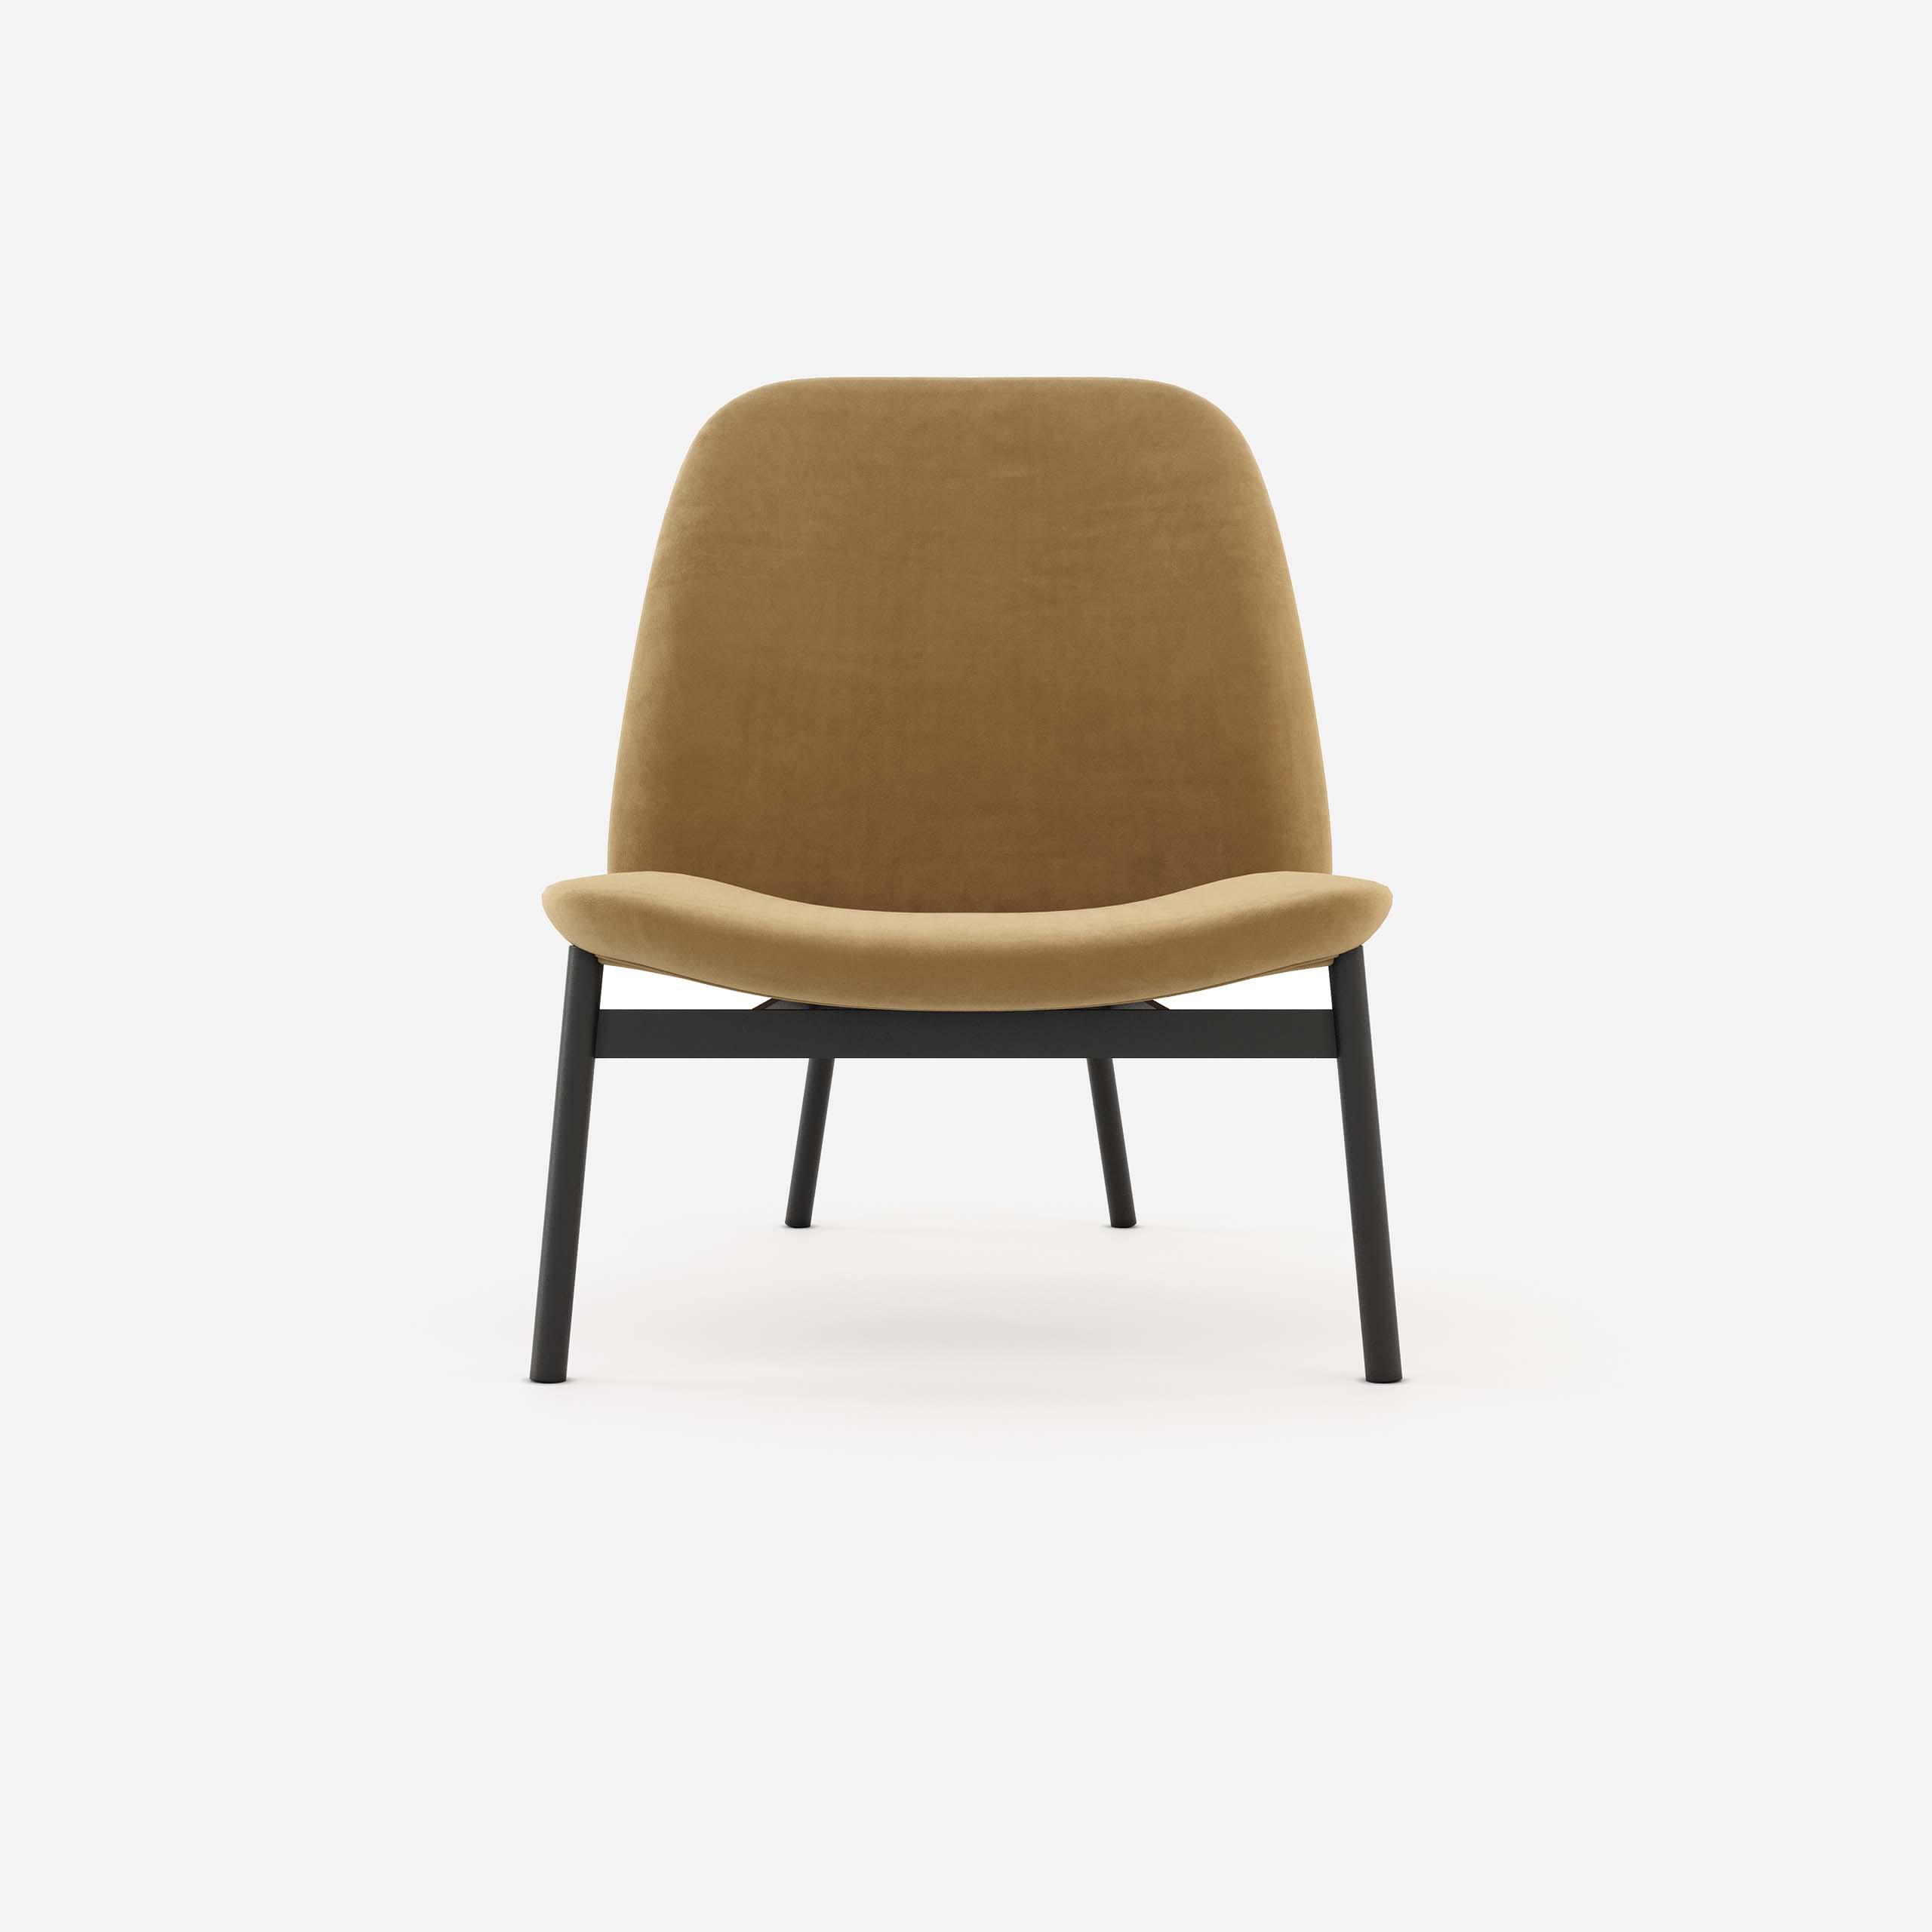 edison-armchair-domkapa-new-collection-2021-living-room-decor (2)